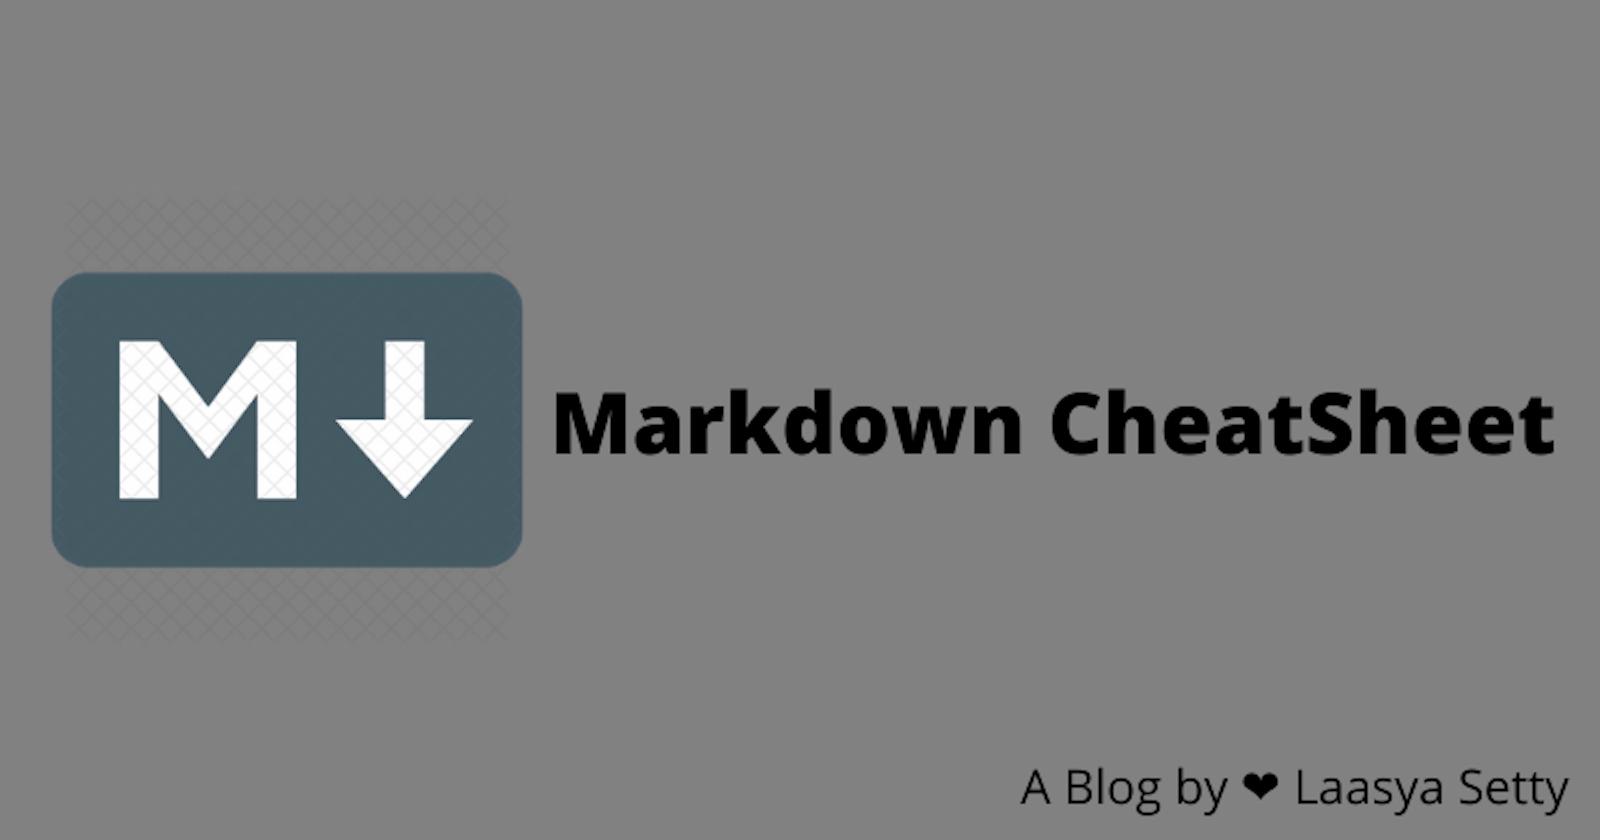 Markdown Cheatsheet to Write a Stunning Article